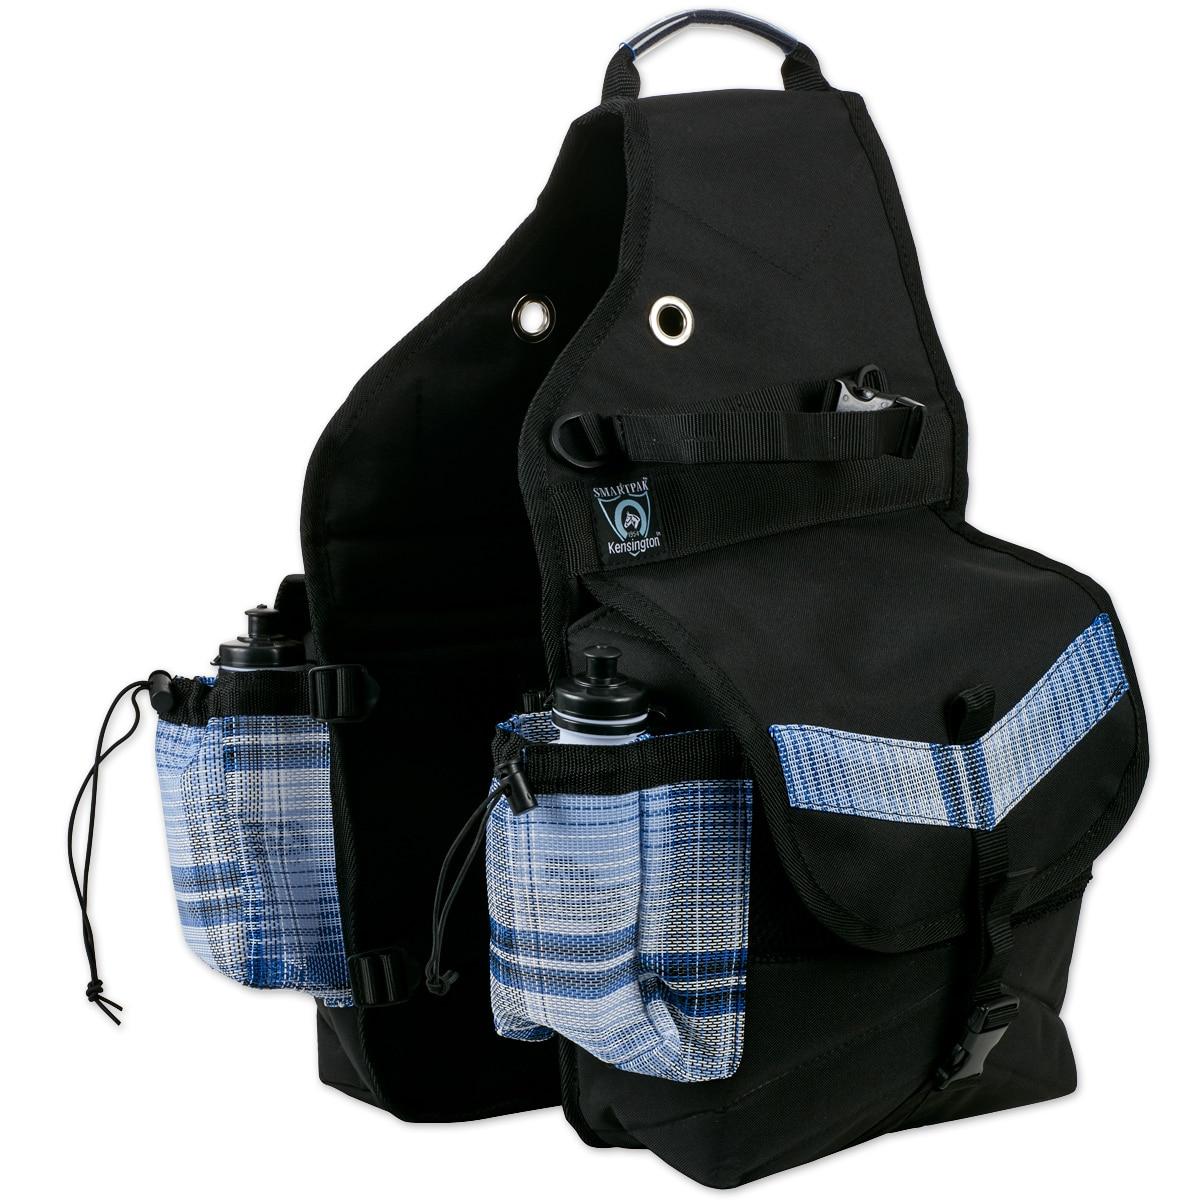 Kensington All Around Insulated Western Saddle Bag - Clearance!